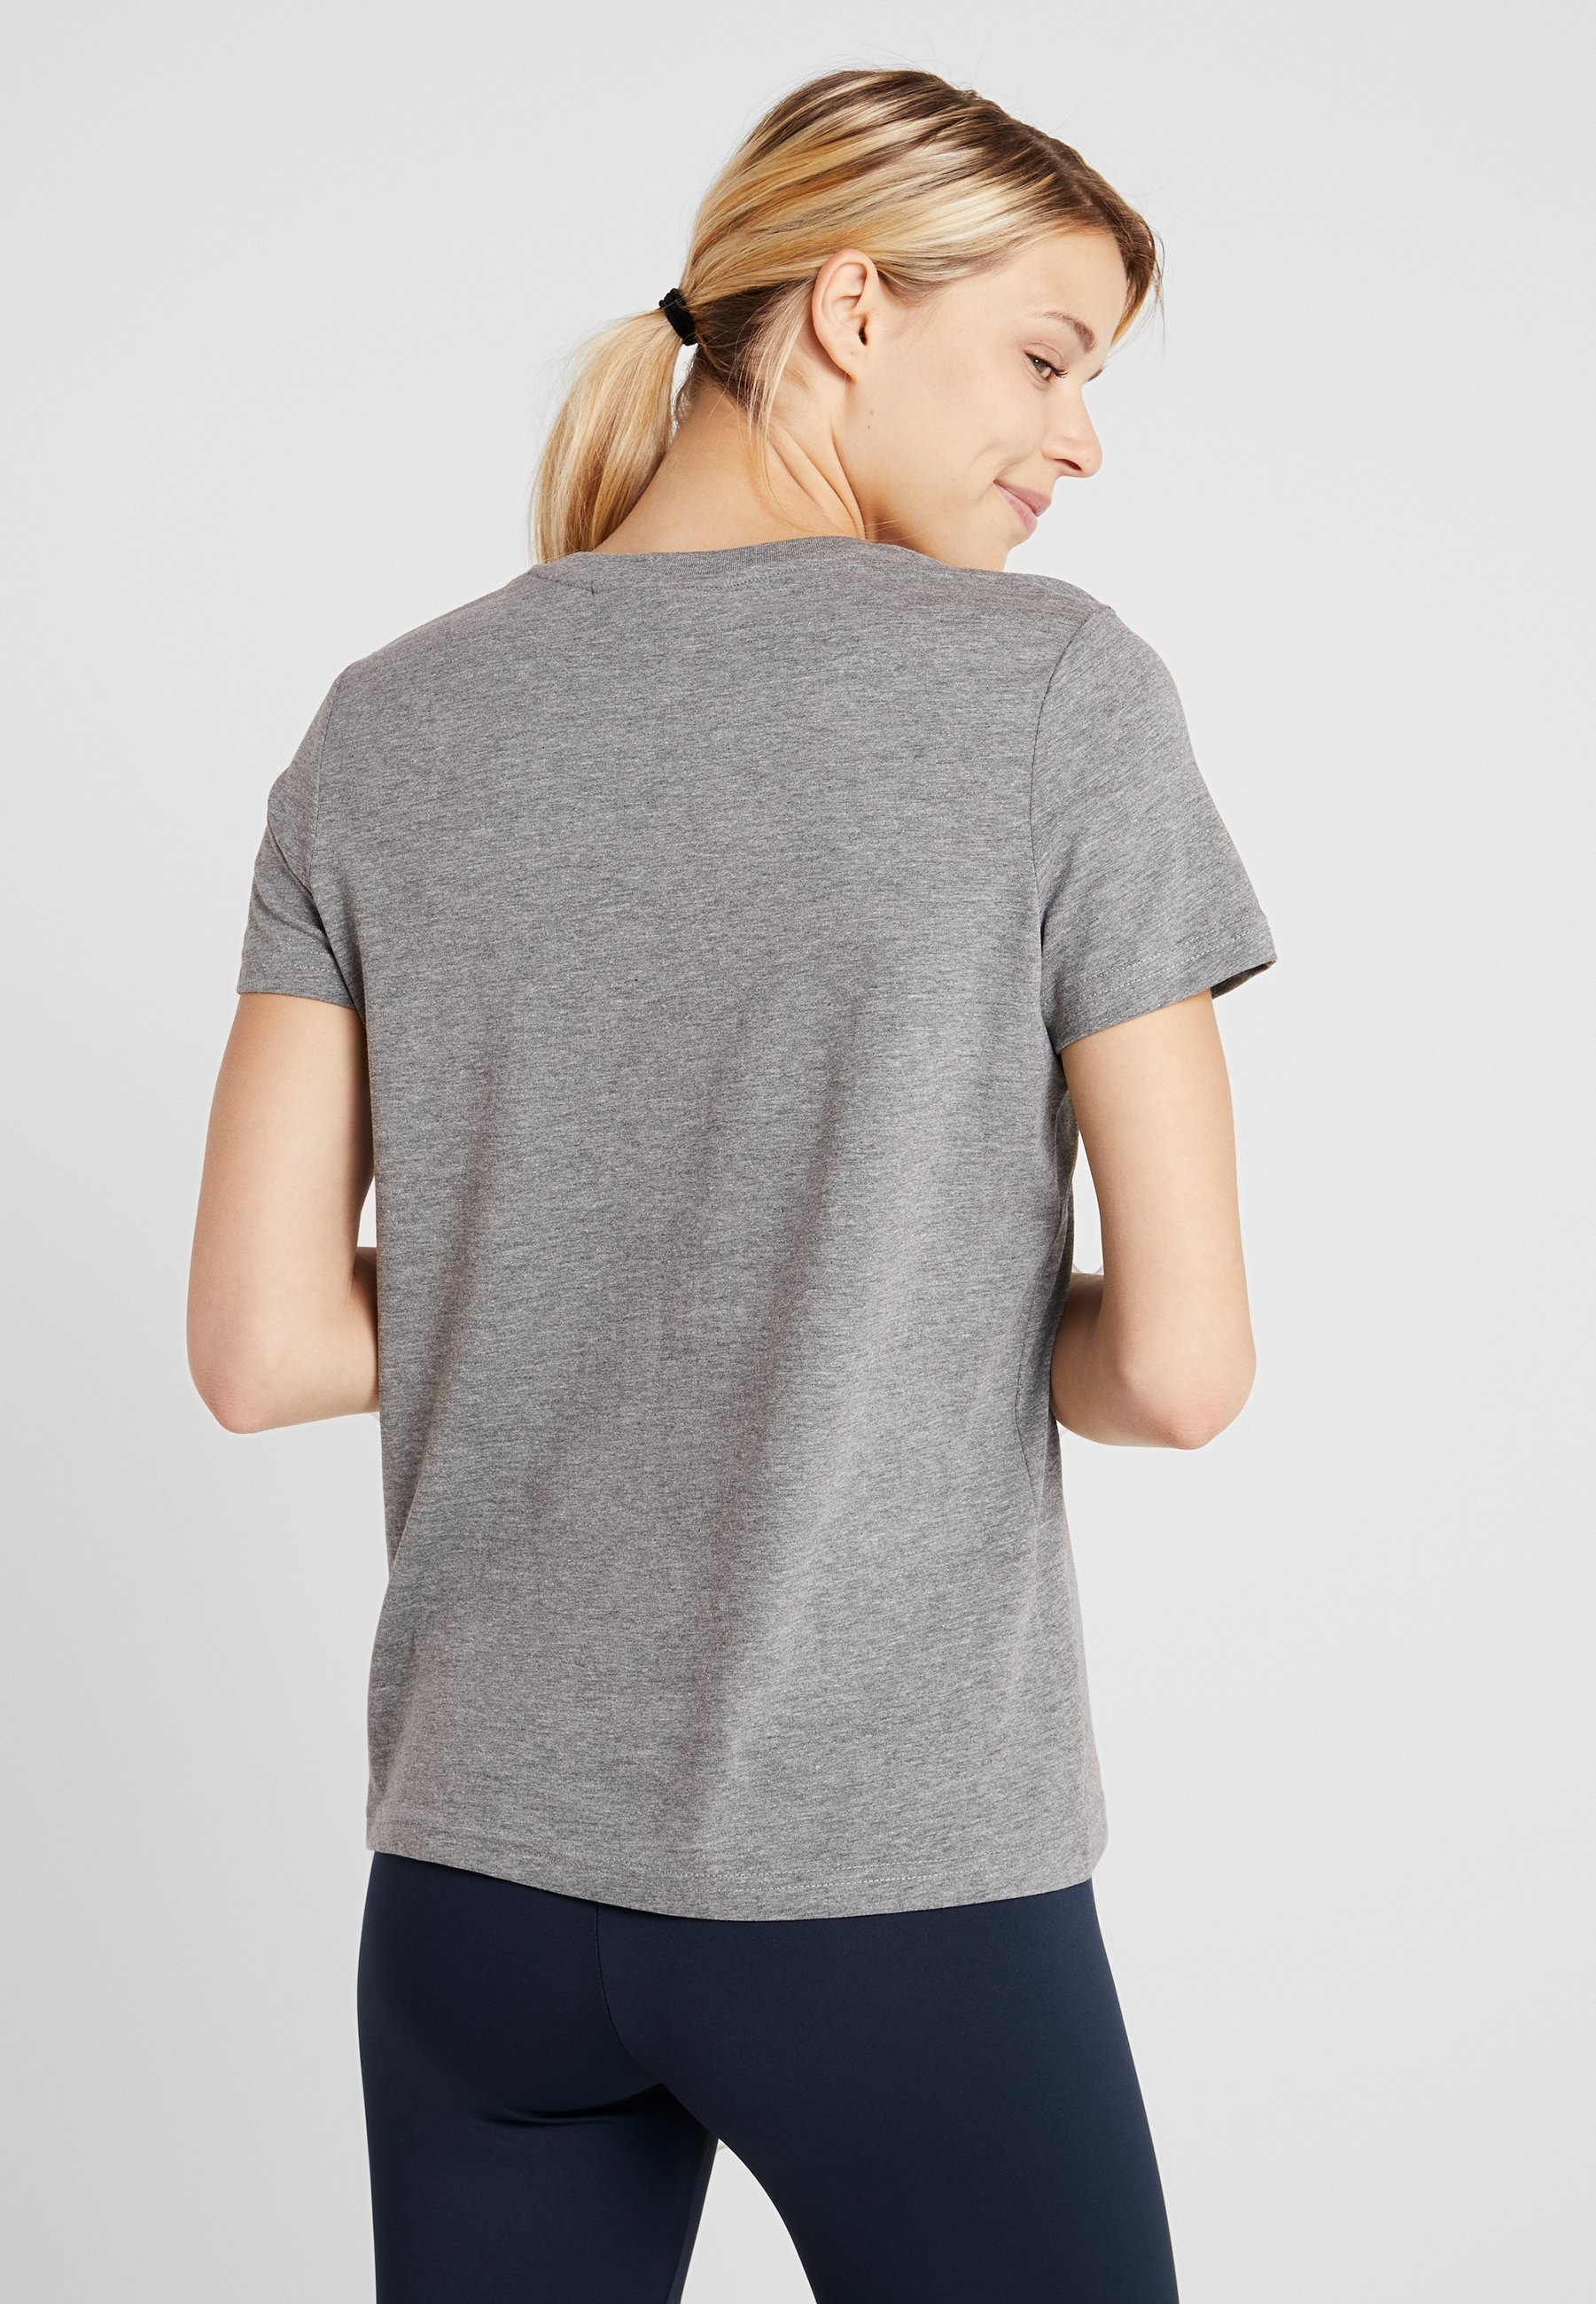 Peak Performance GROUNDT - T-shirt imprimé grey melange